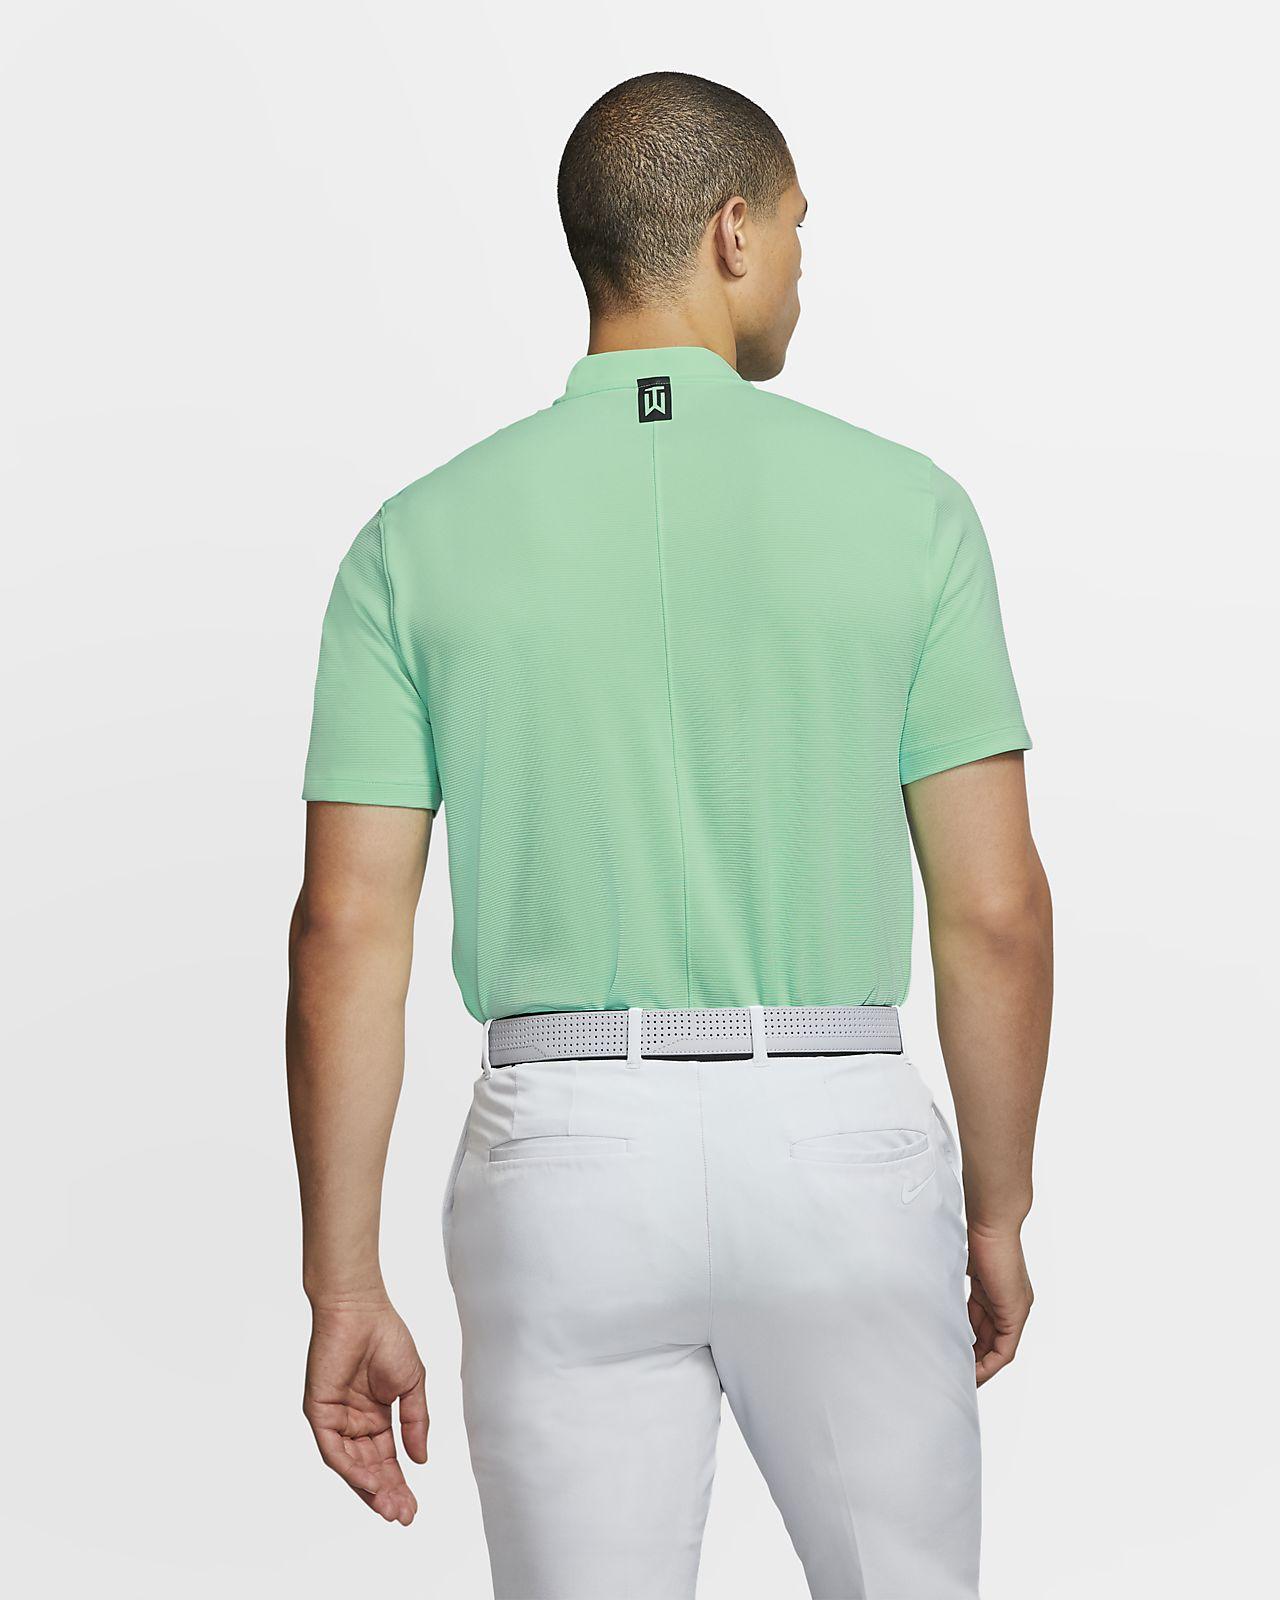 4589b2eb8 Nike Tiger Woods Golf Shirts Uk - DREAMWORKS